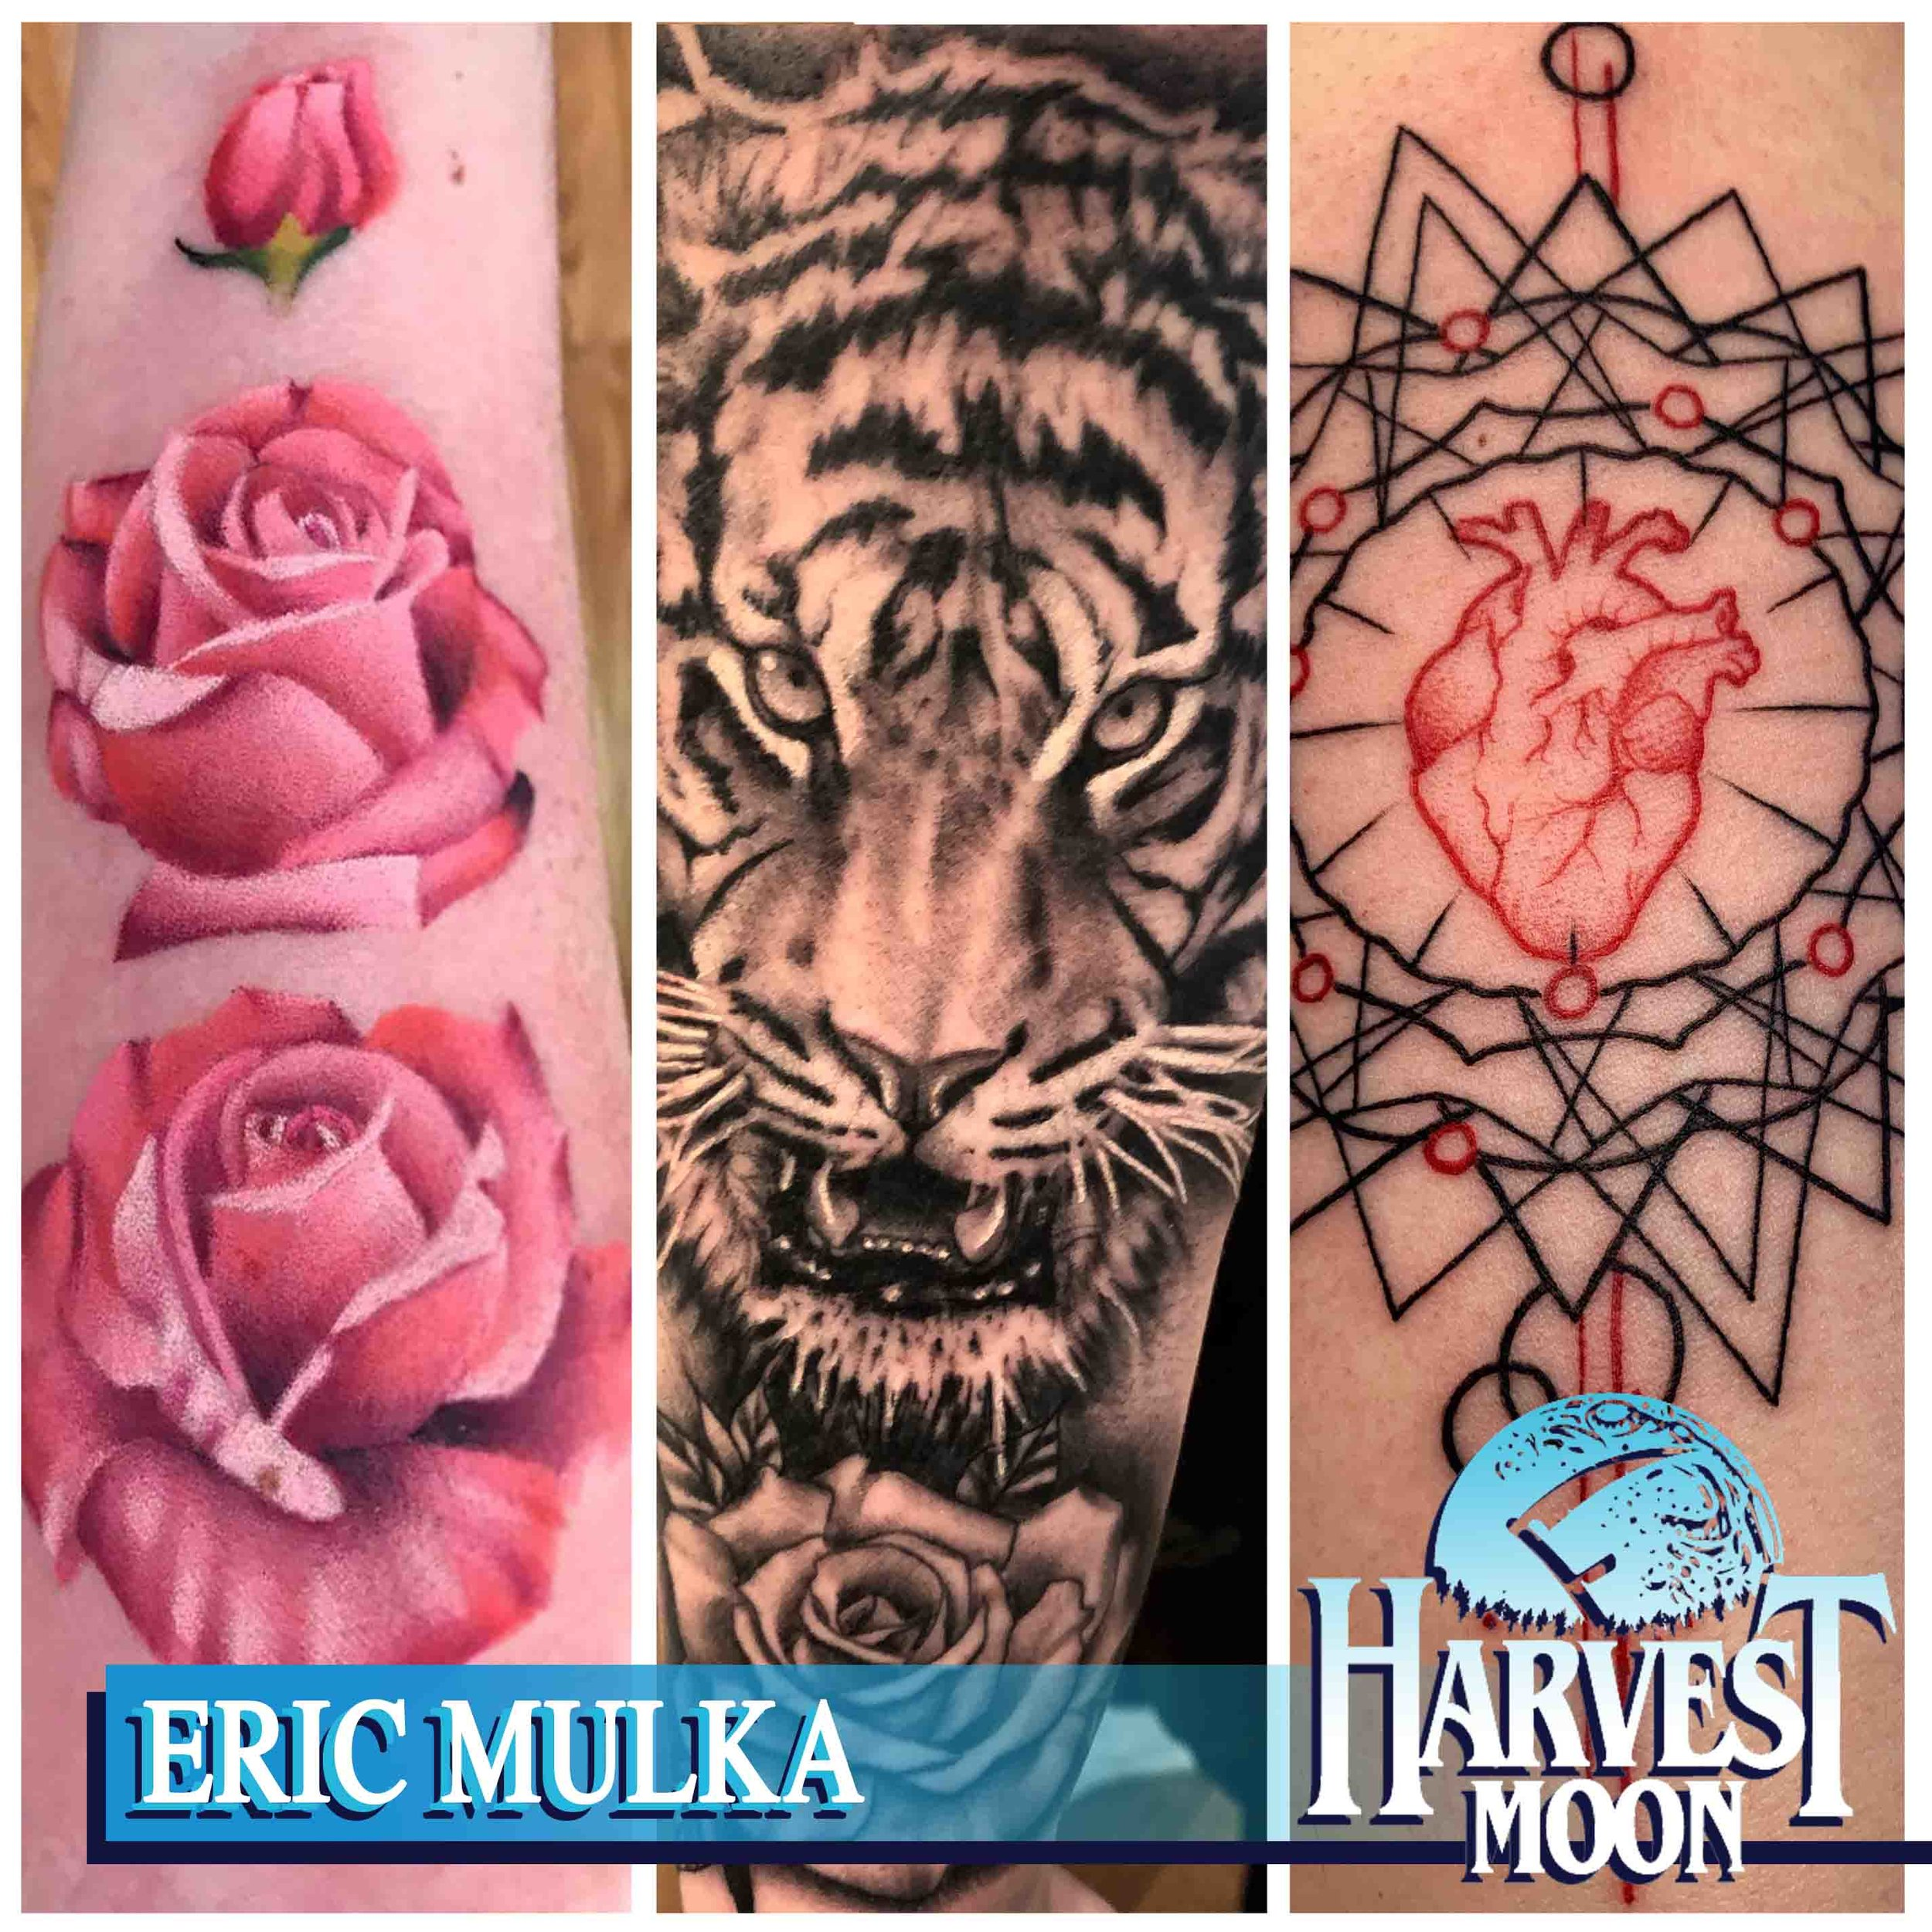 North Main Tattoo Studio Plymouth, MI